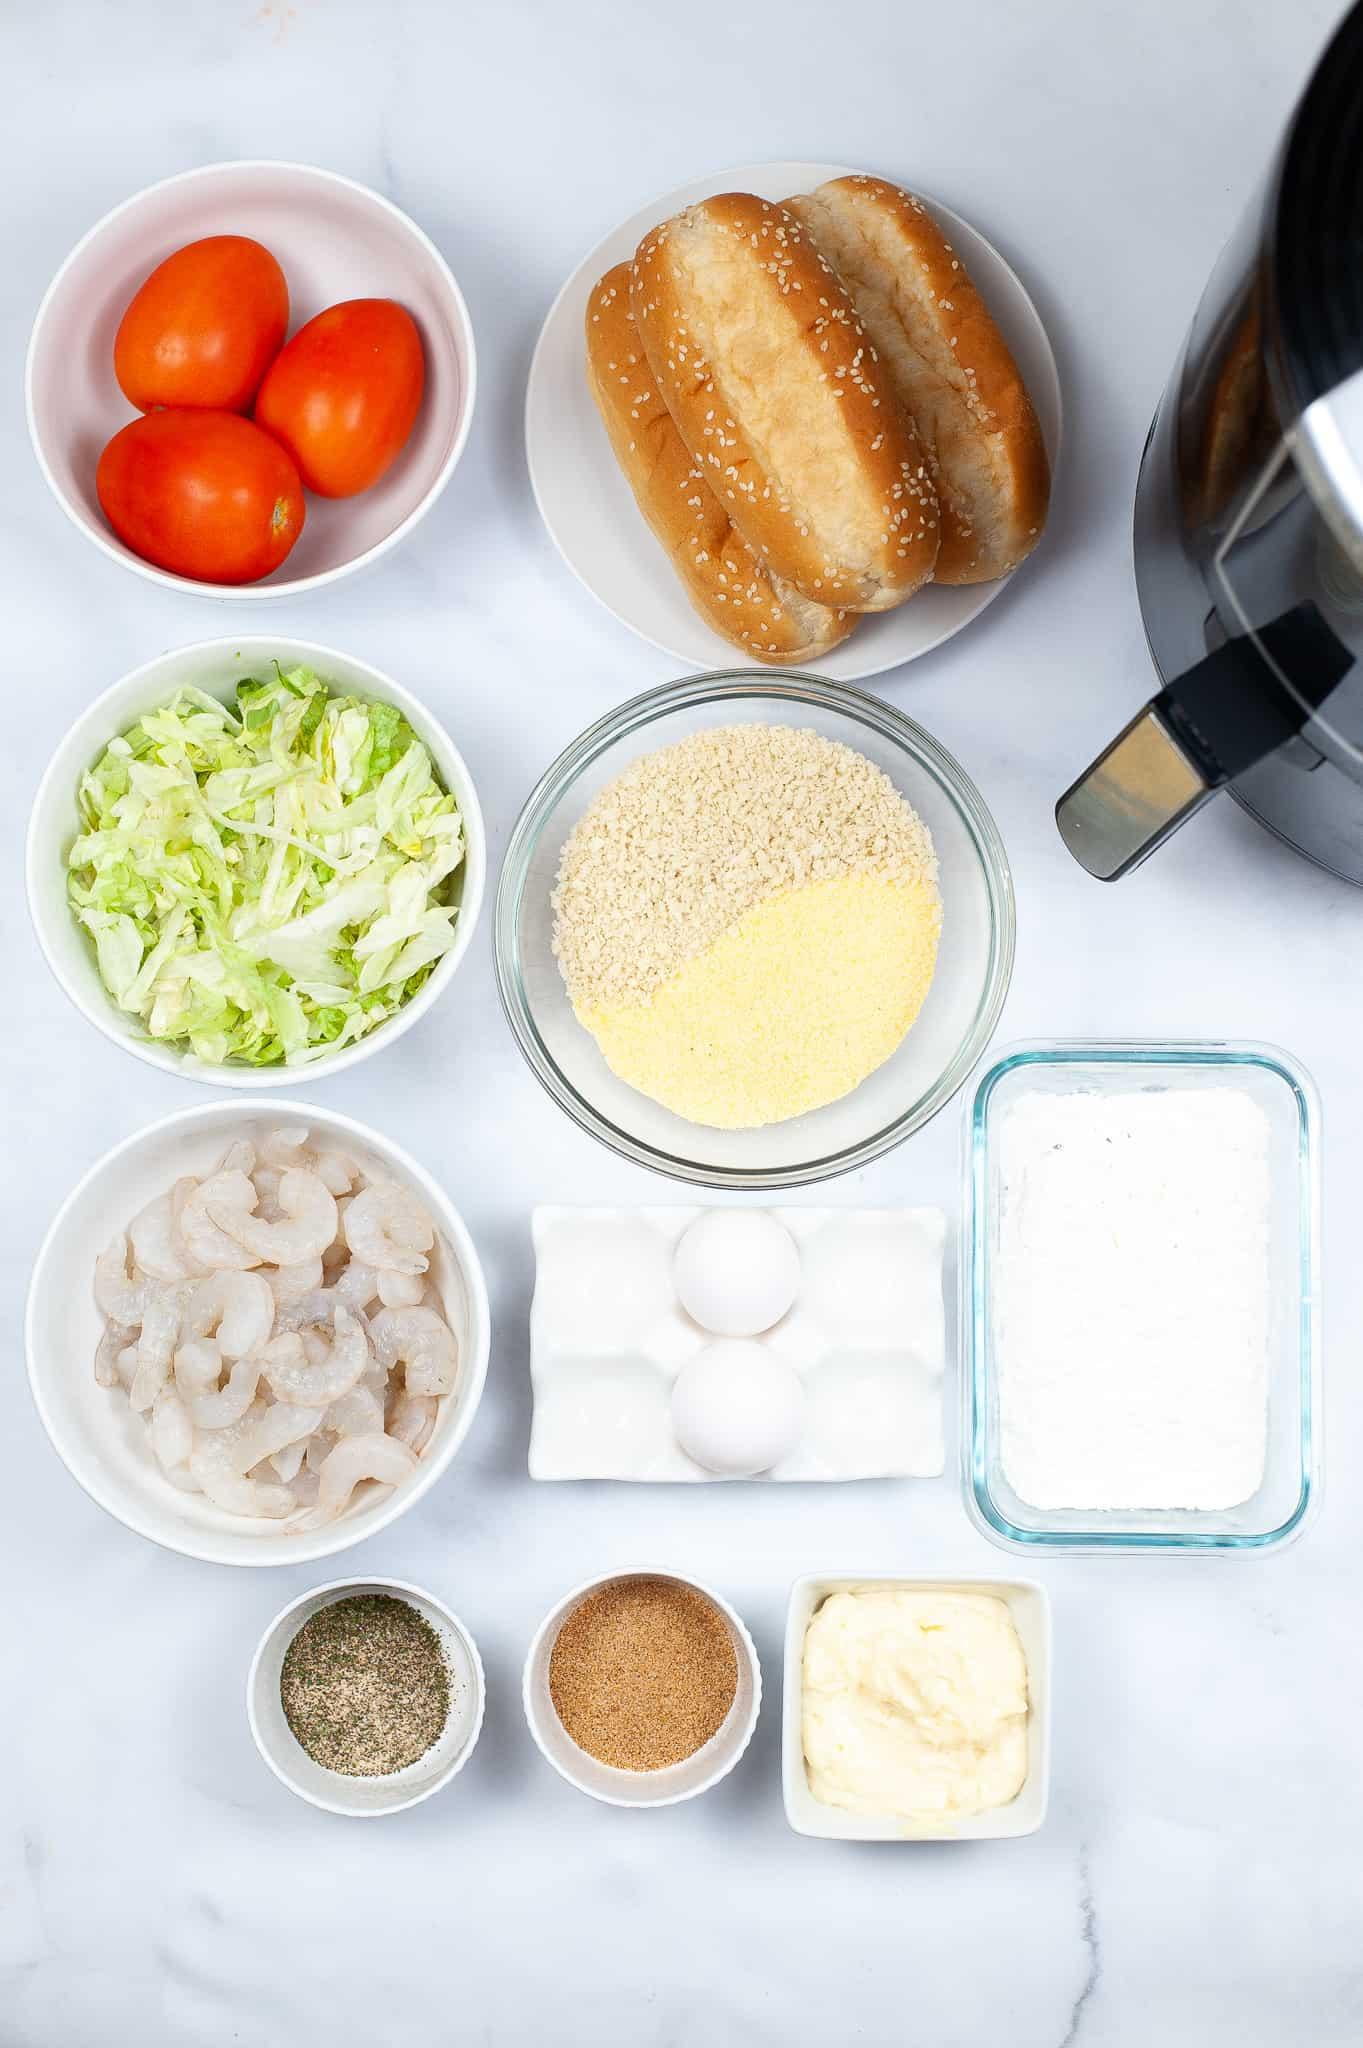 All components necessary to make shrimp po boy sandwiches. Shrimp, rolls, lettuce tomato, coating and seasoning.